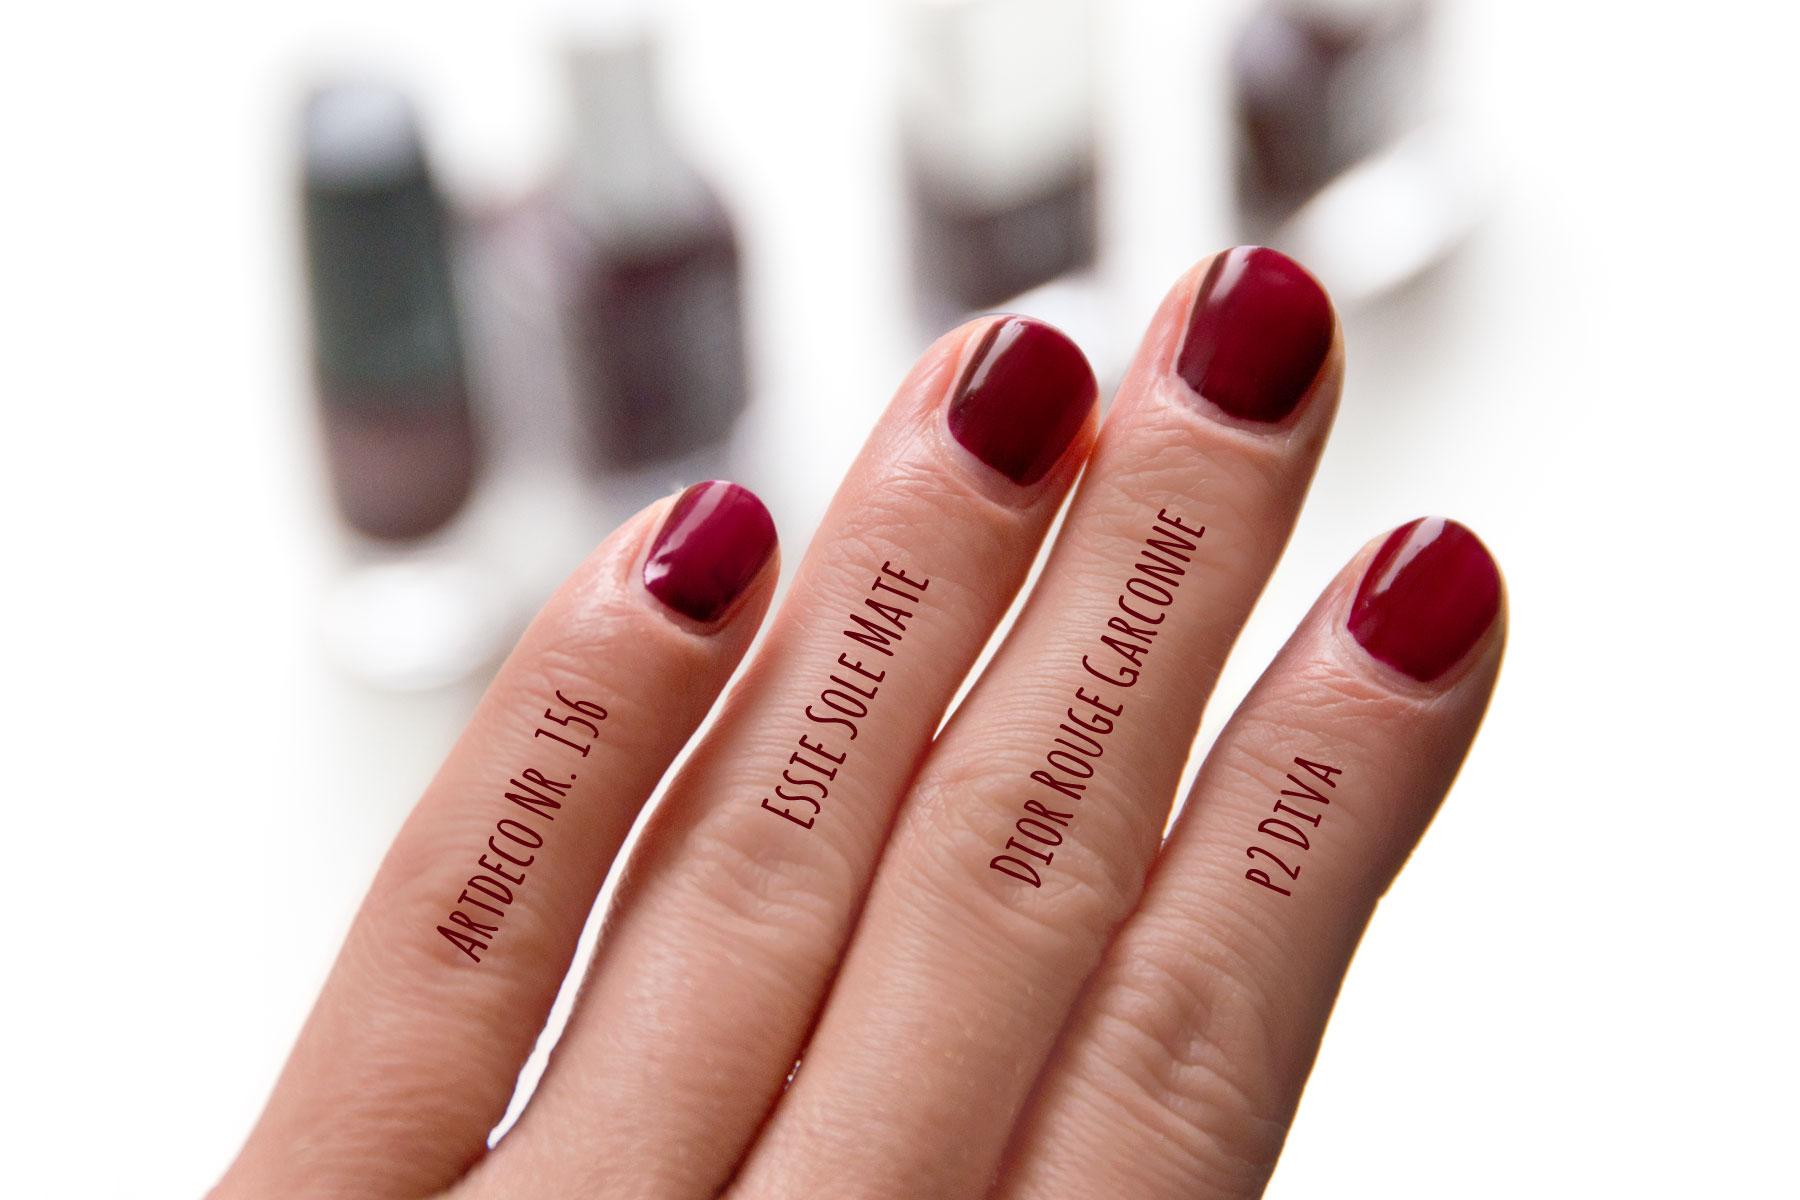 Dior - Vernis Rouge Garçonne | Marie-Theres Schindler - Beauty Blog